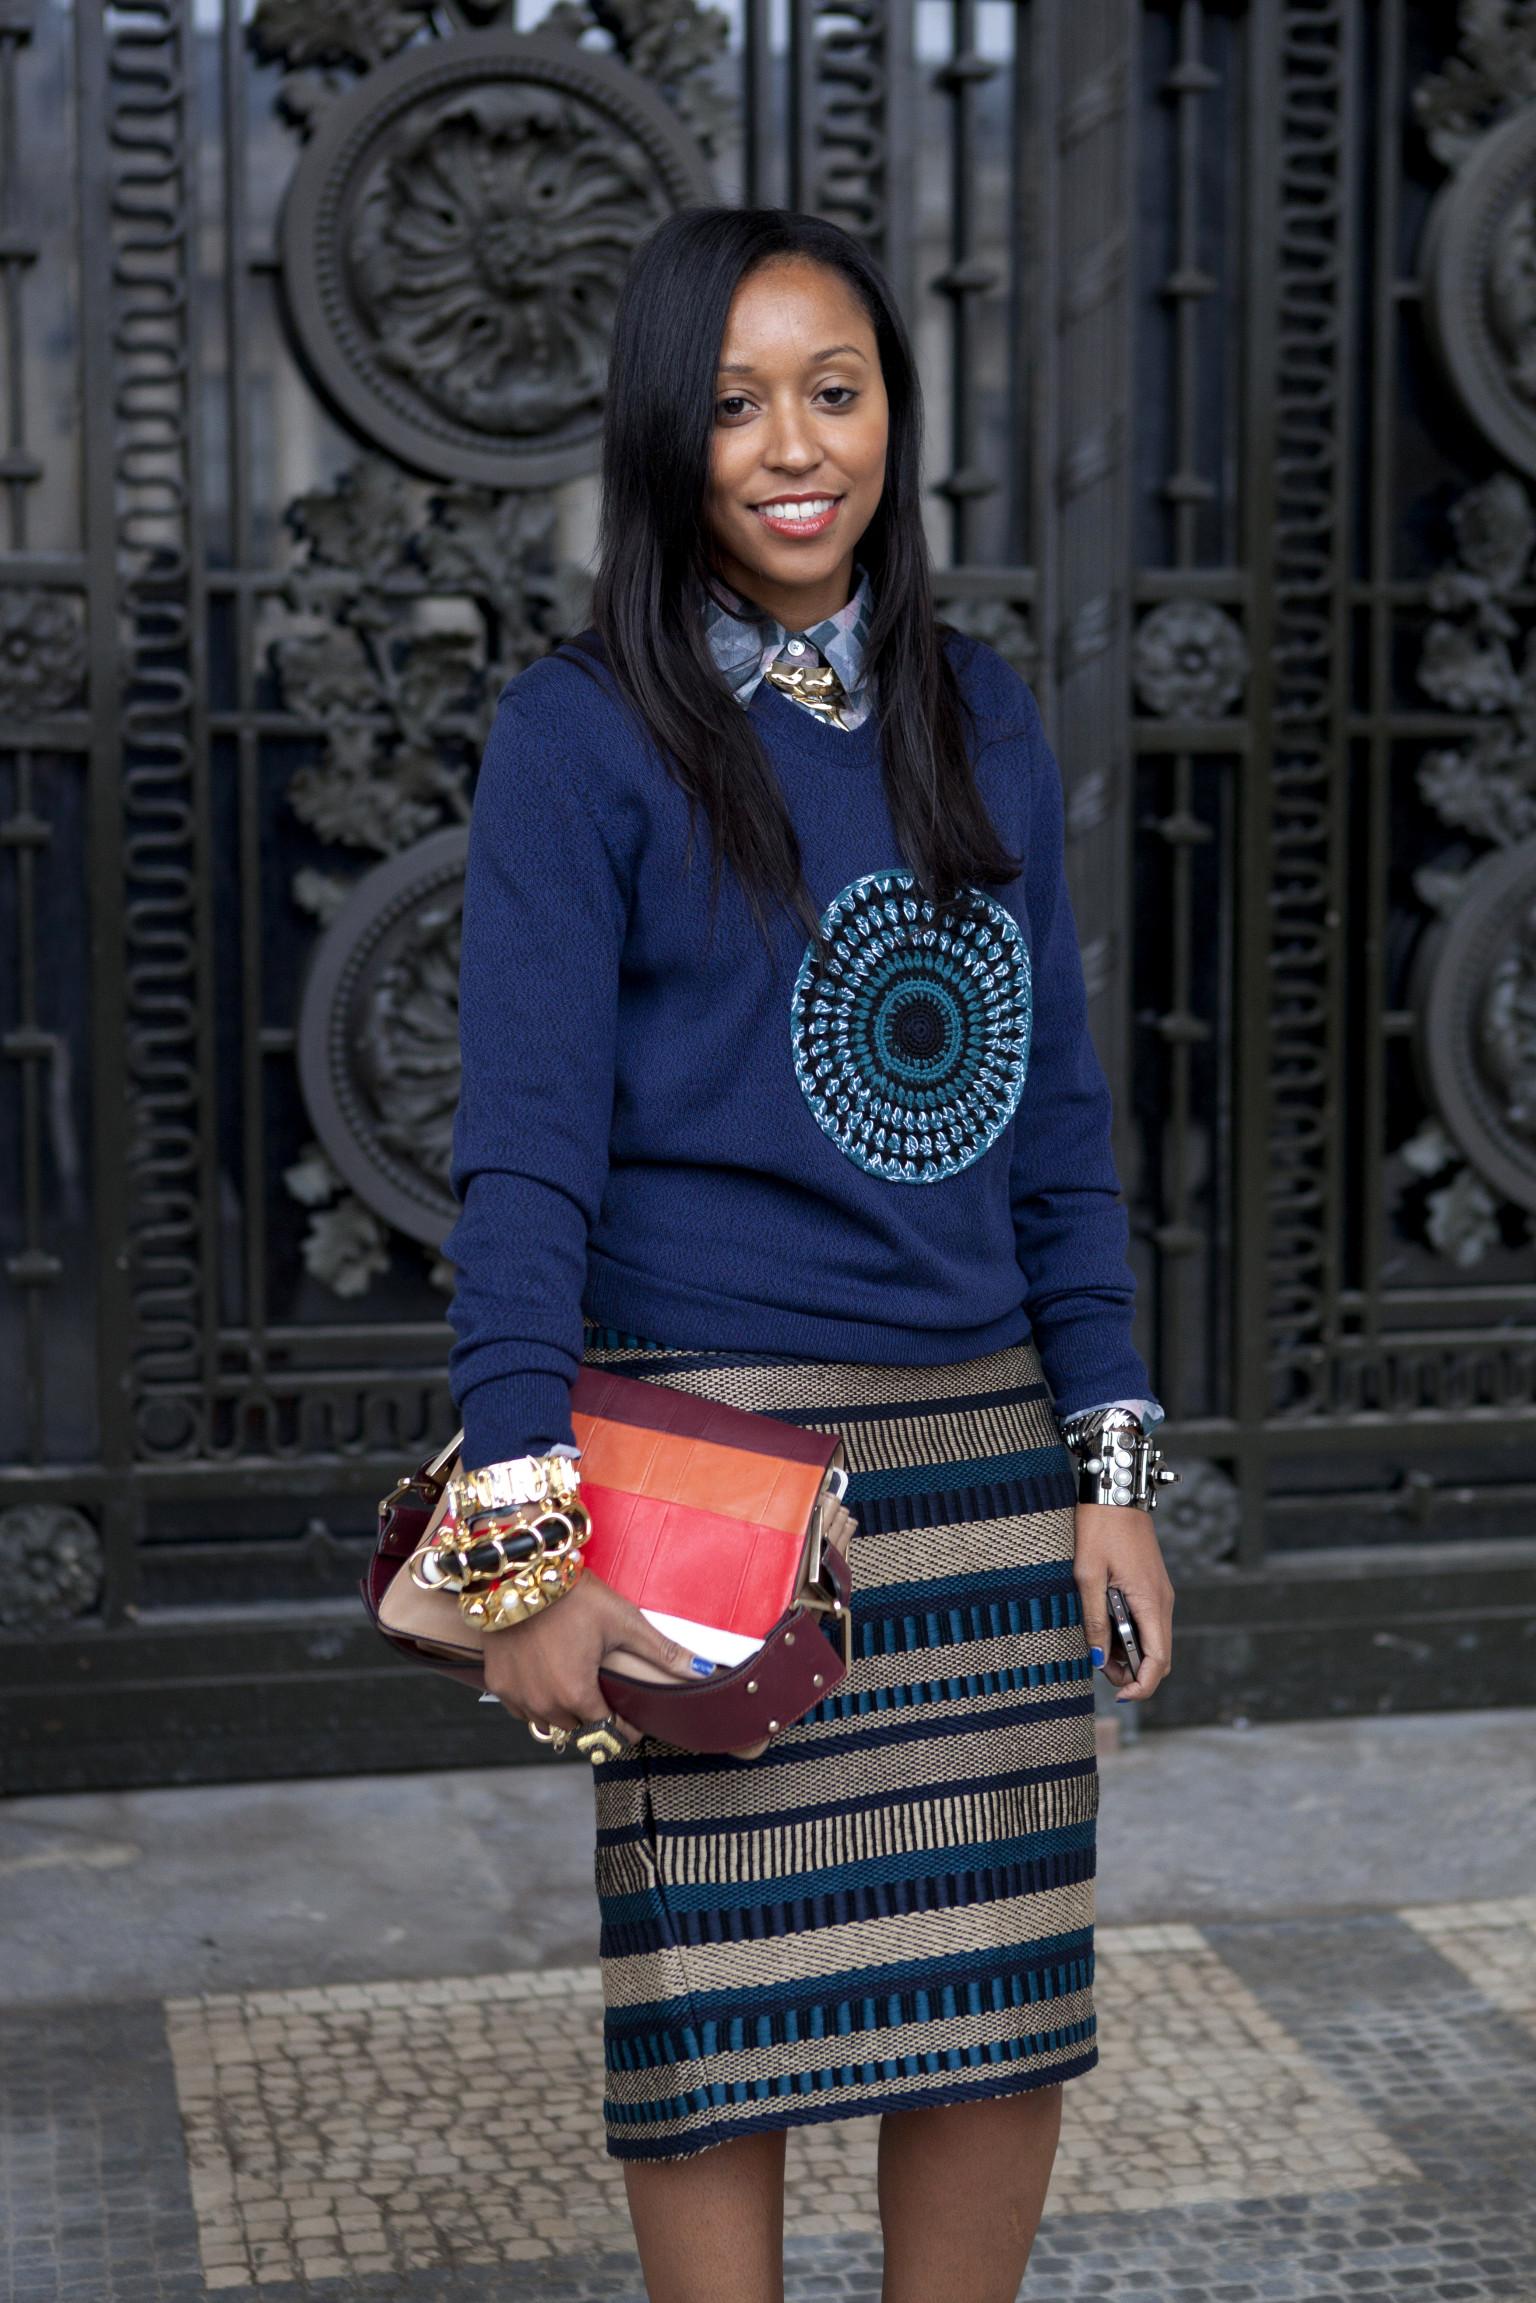 shiona turini named fashion market director at cosmo